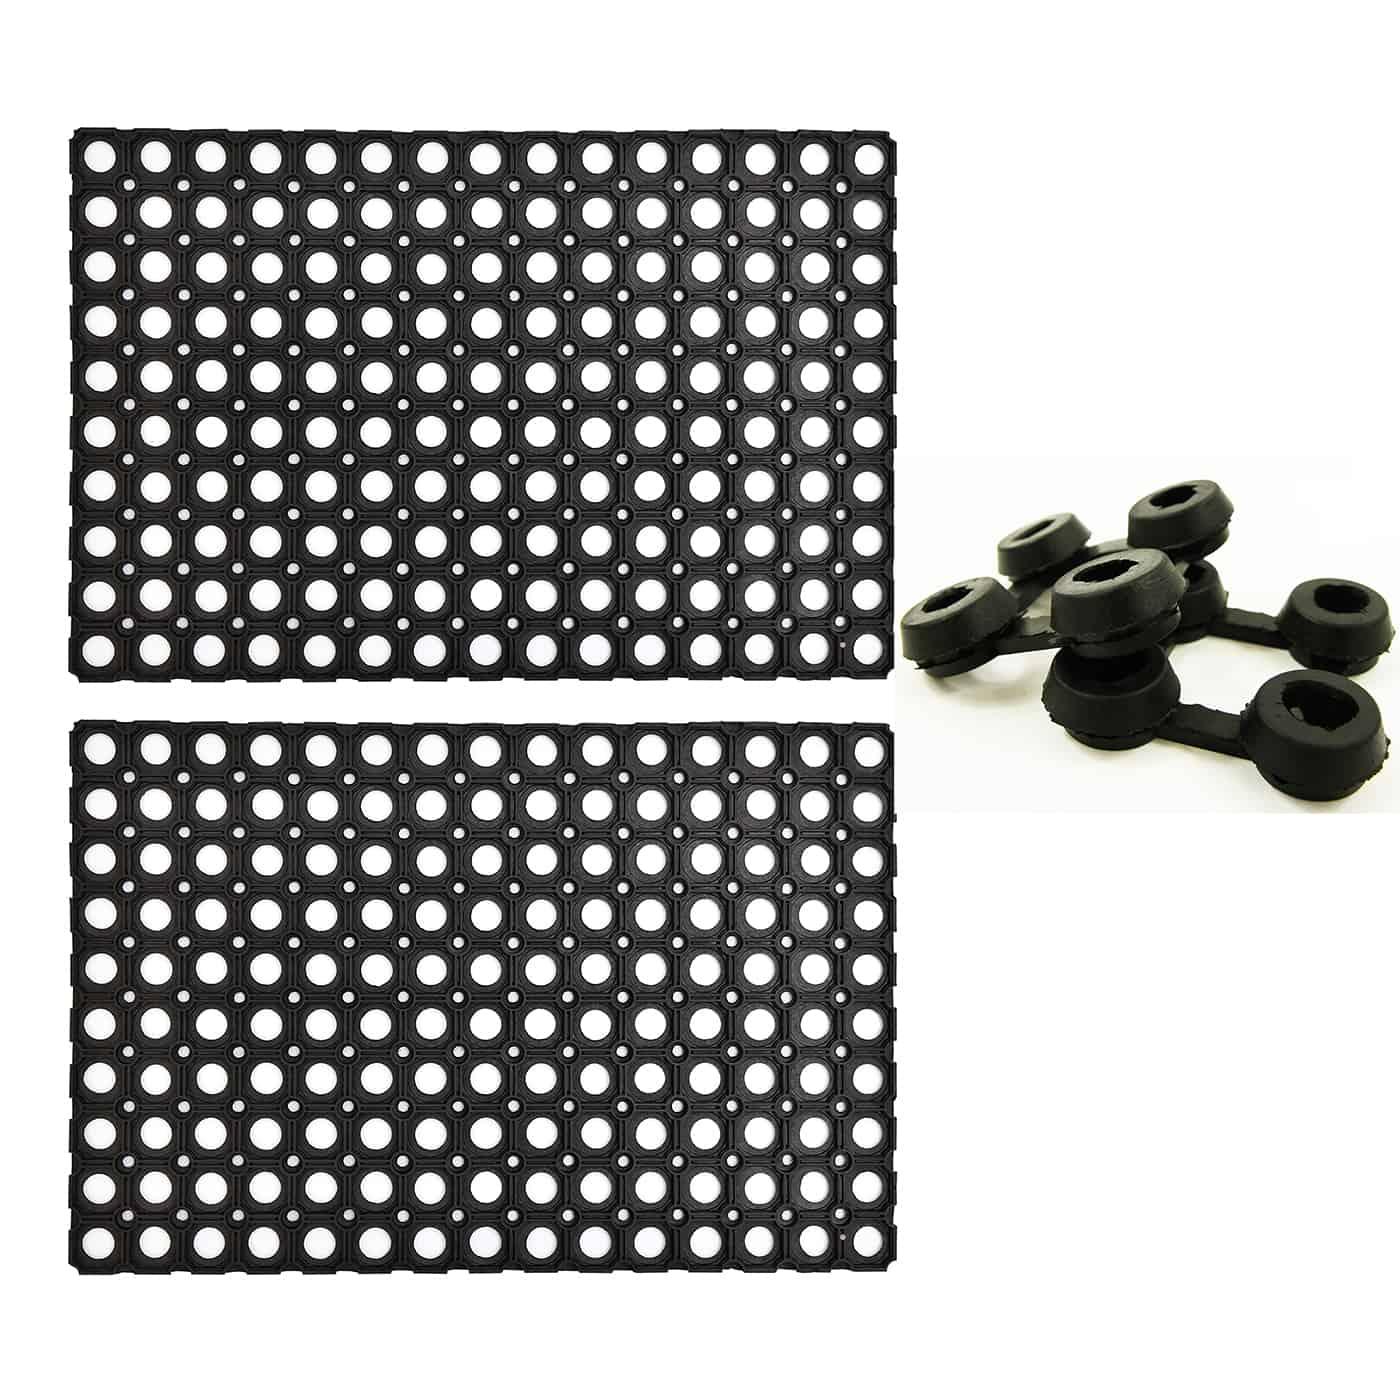 Set of 2 Mats Outdoor Interlocking Rubber Floor Mat Anti-Fatigue with 2 connectors